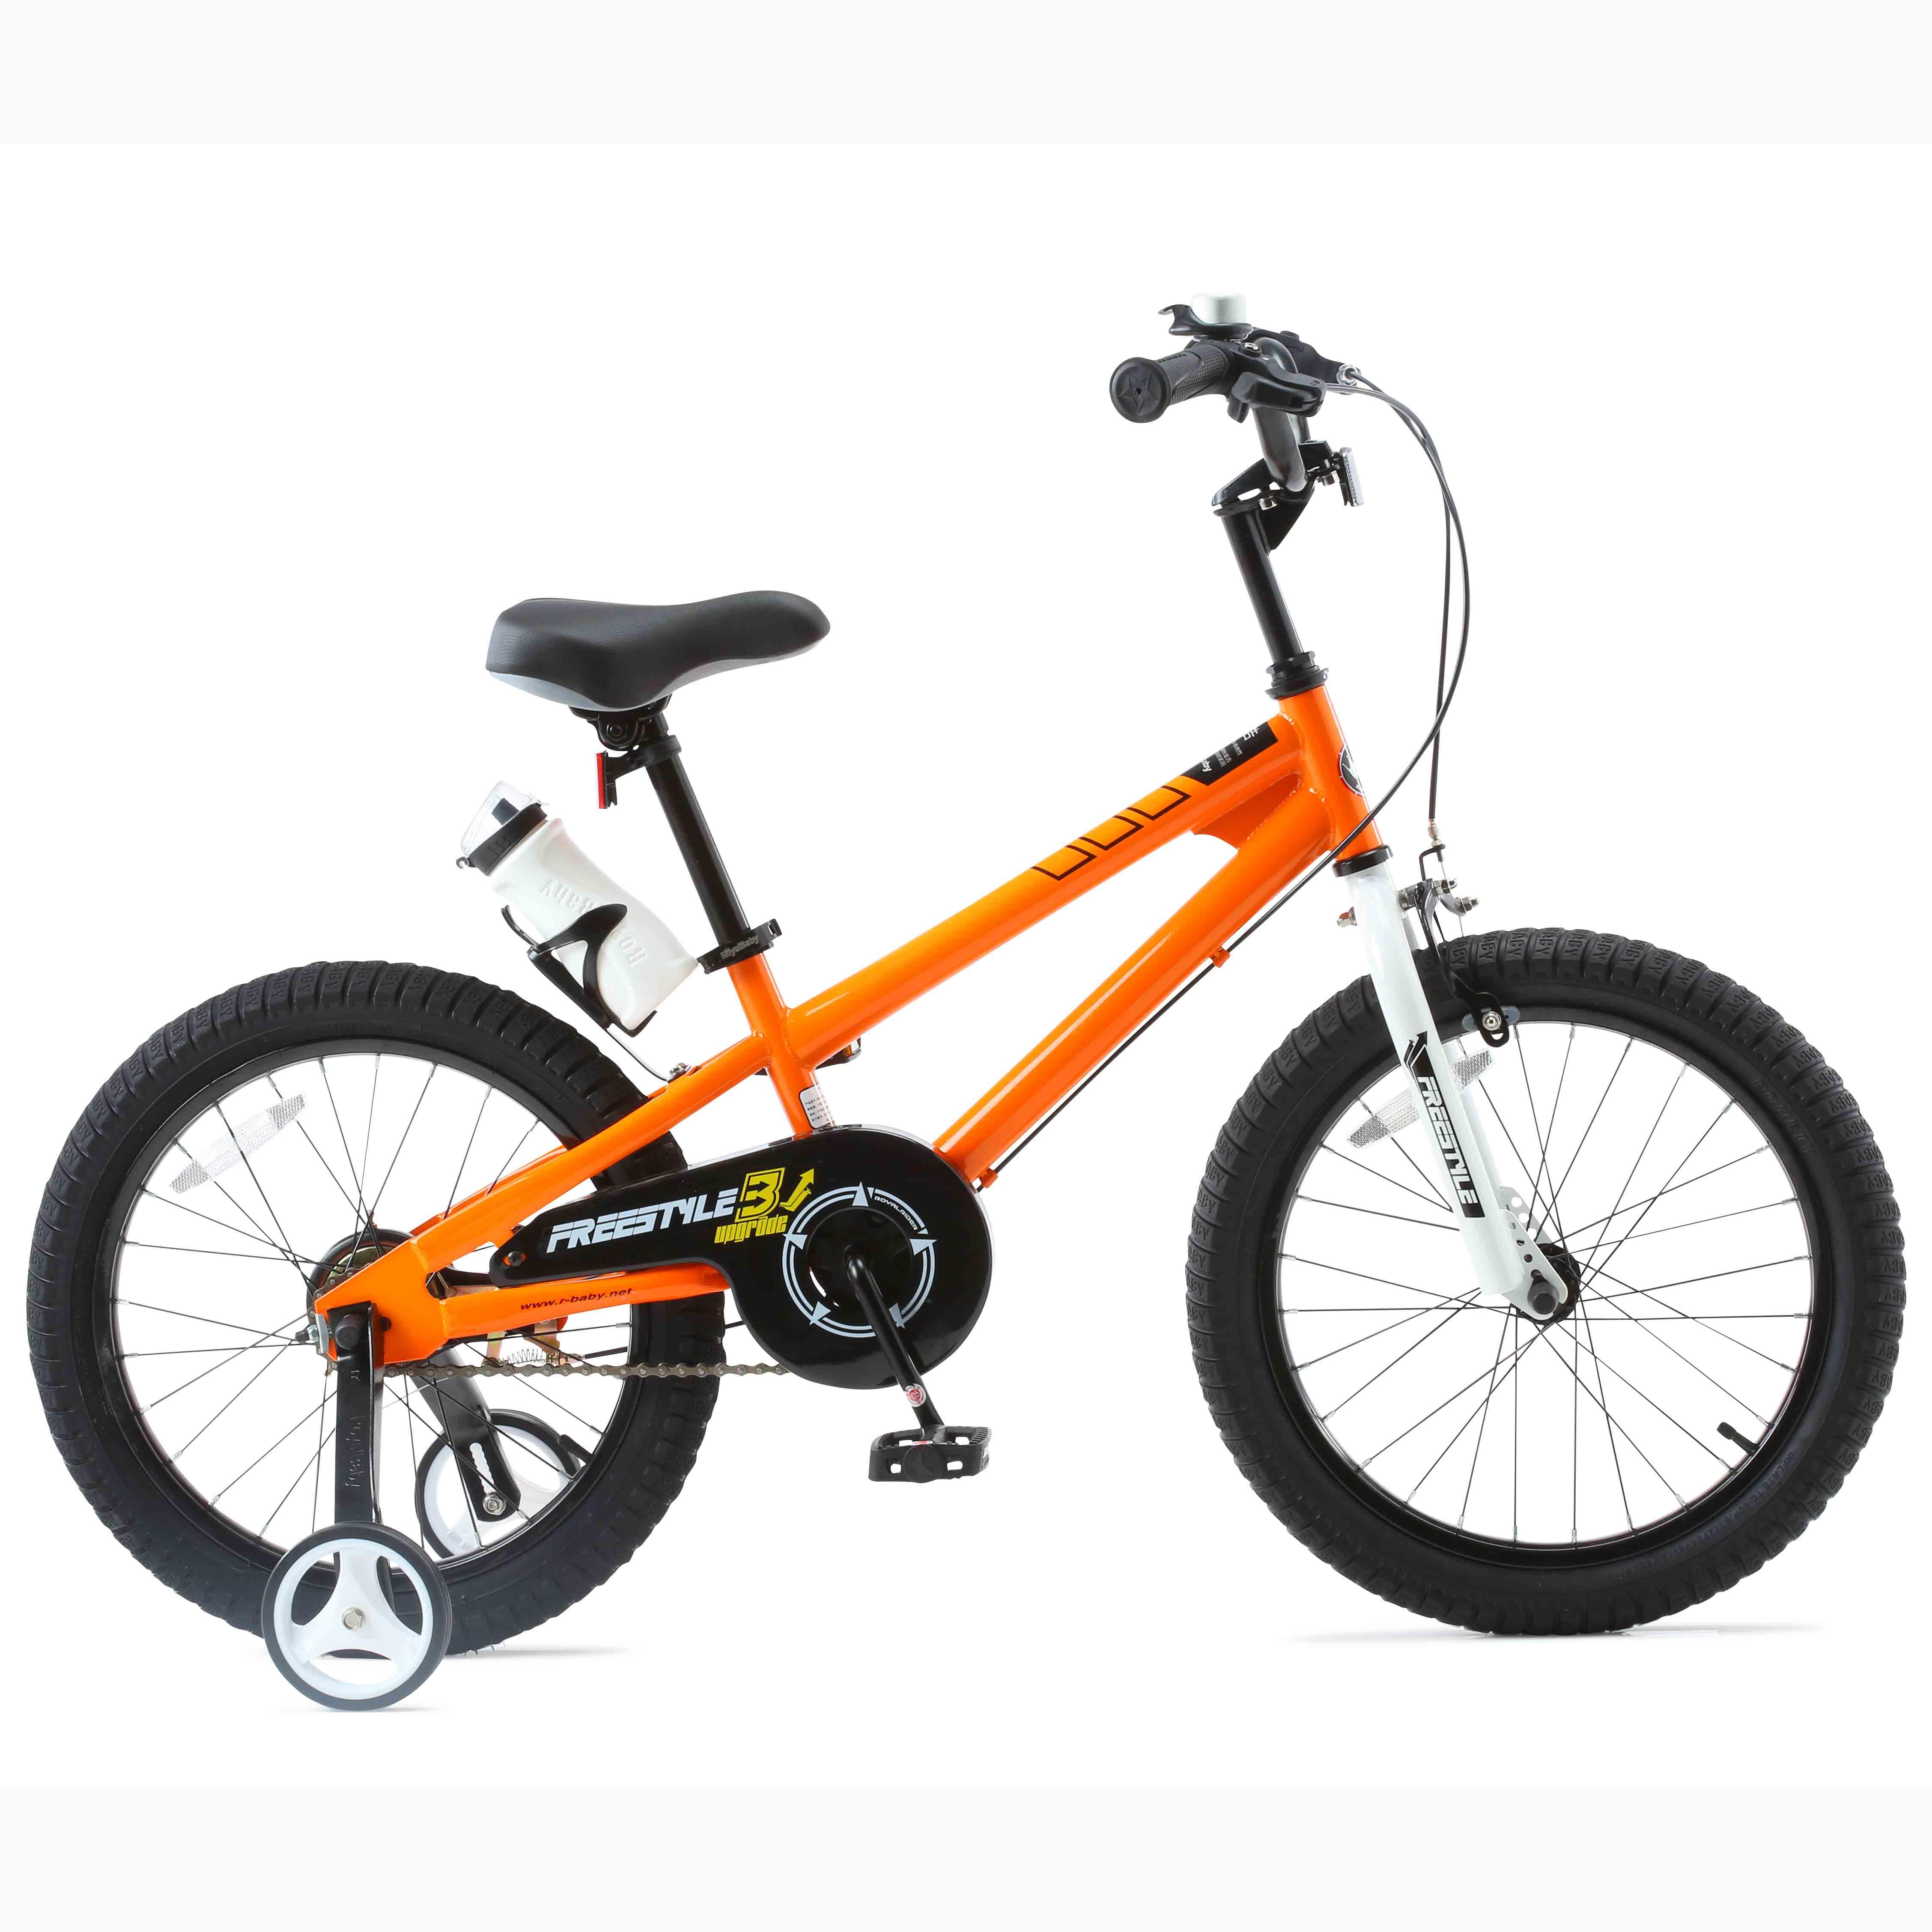 Фото Велосипед RoyalBaby FREESTYLE 18″, оранжевый